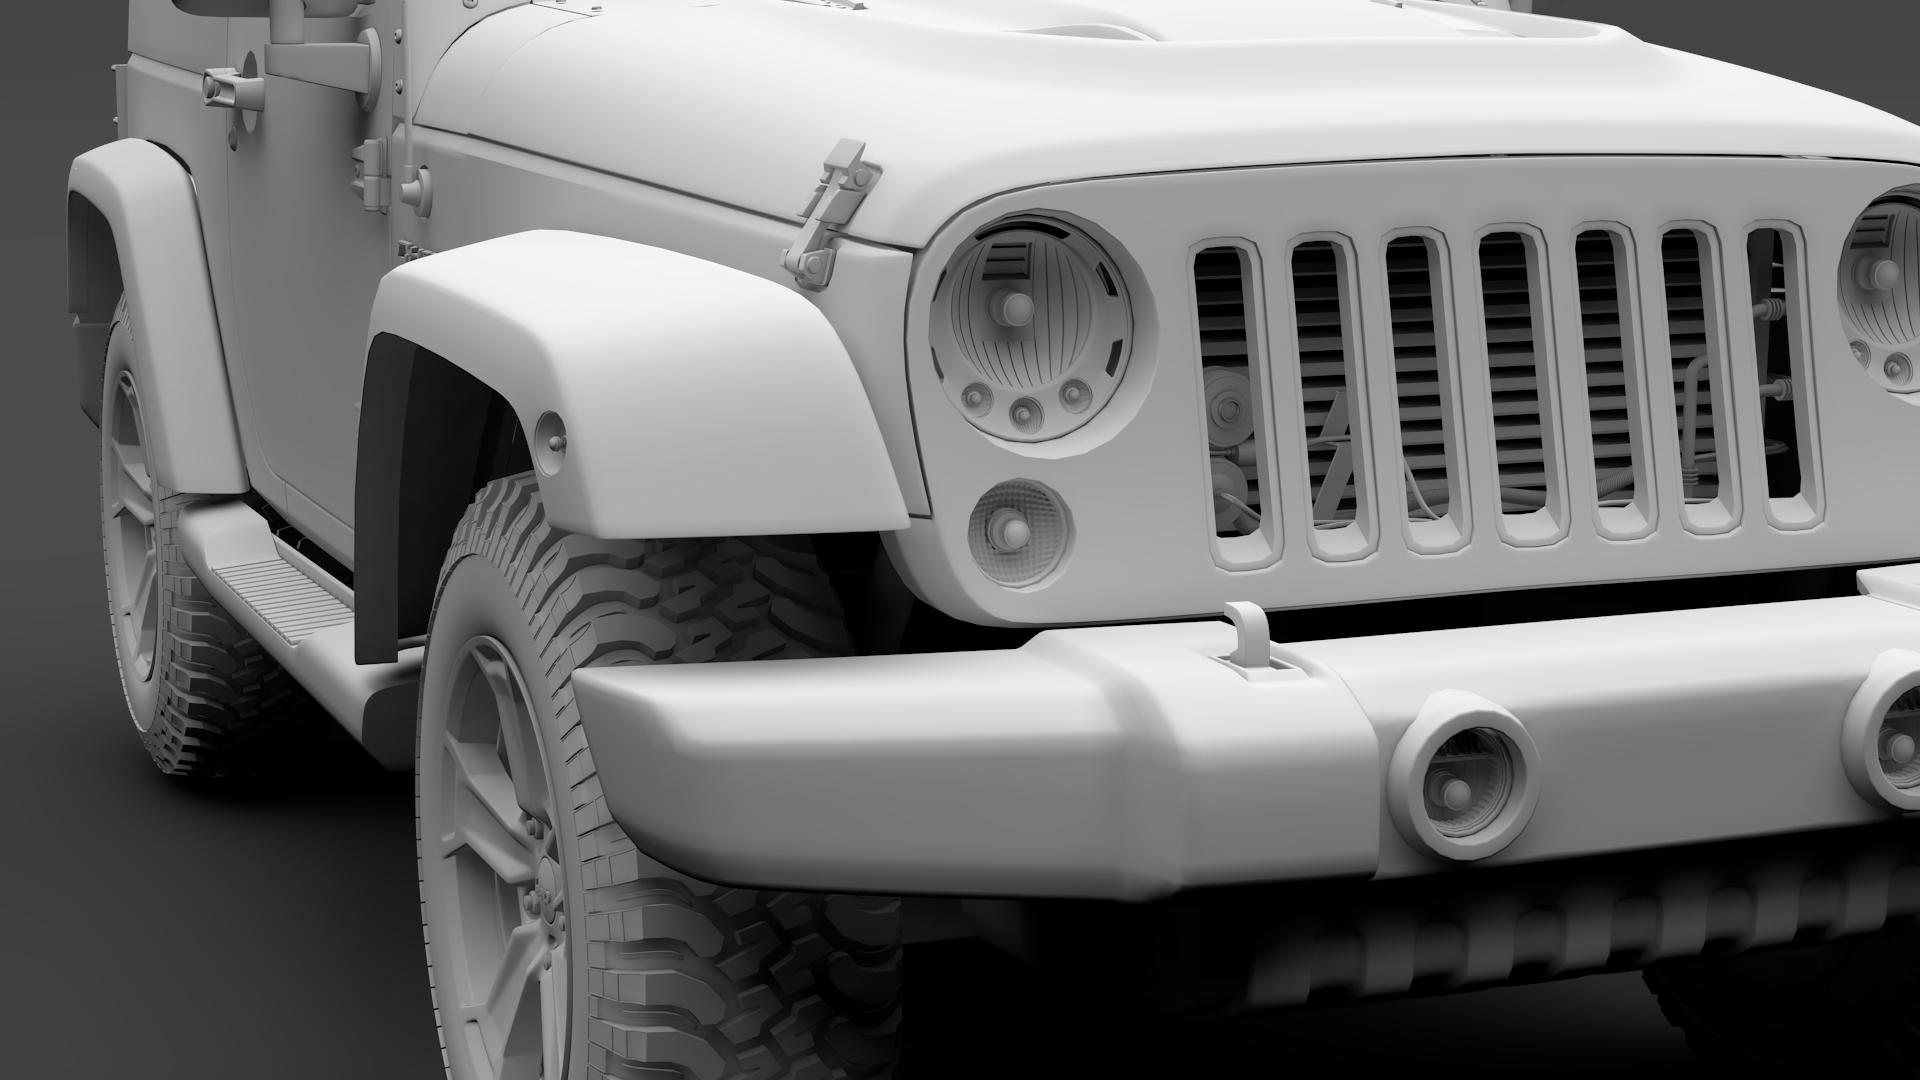 jeep wrangler chief jk 2017 3d model max fbx c4d lwo ma mb hrc xsi obj 276892